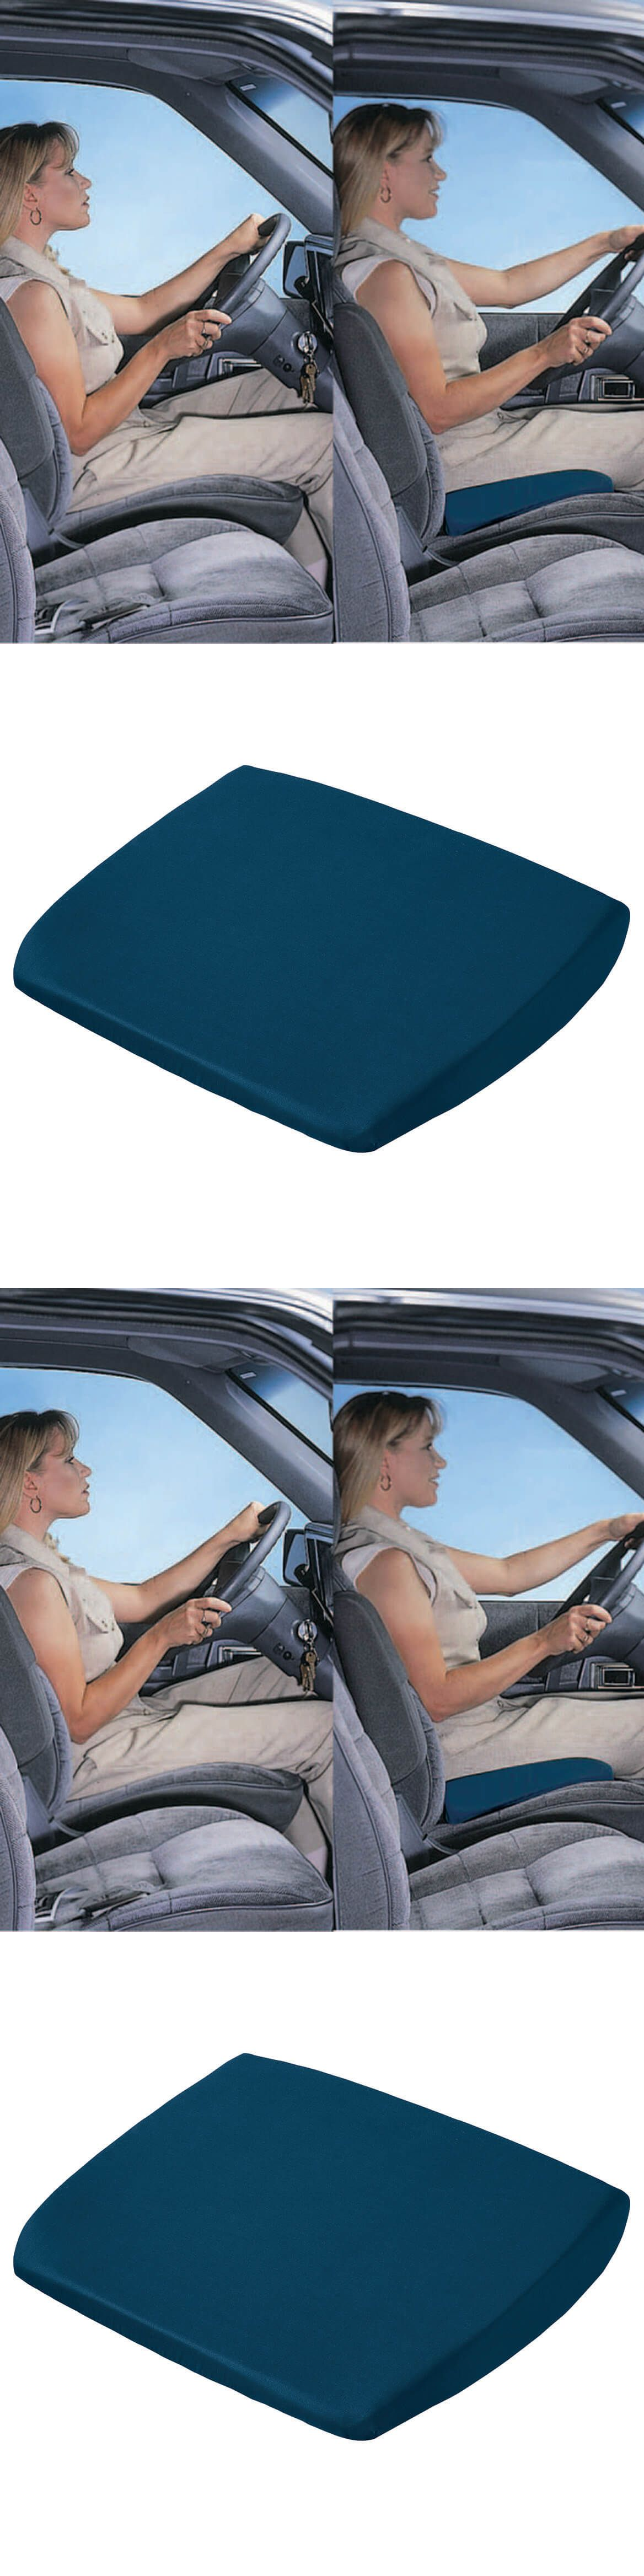 Seat And Posture Cushions 182135 Improve Automible Wedge Foam Cushion Car Riser Pad